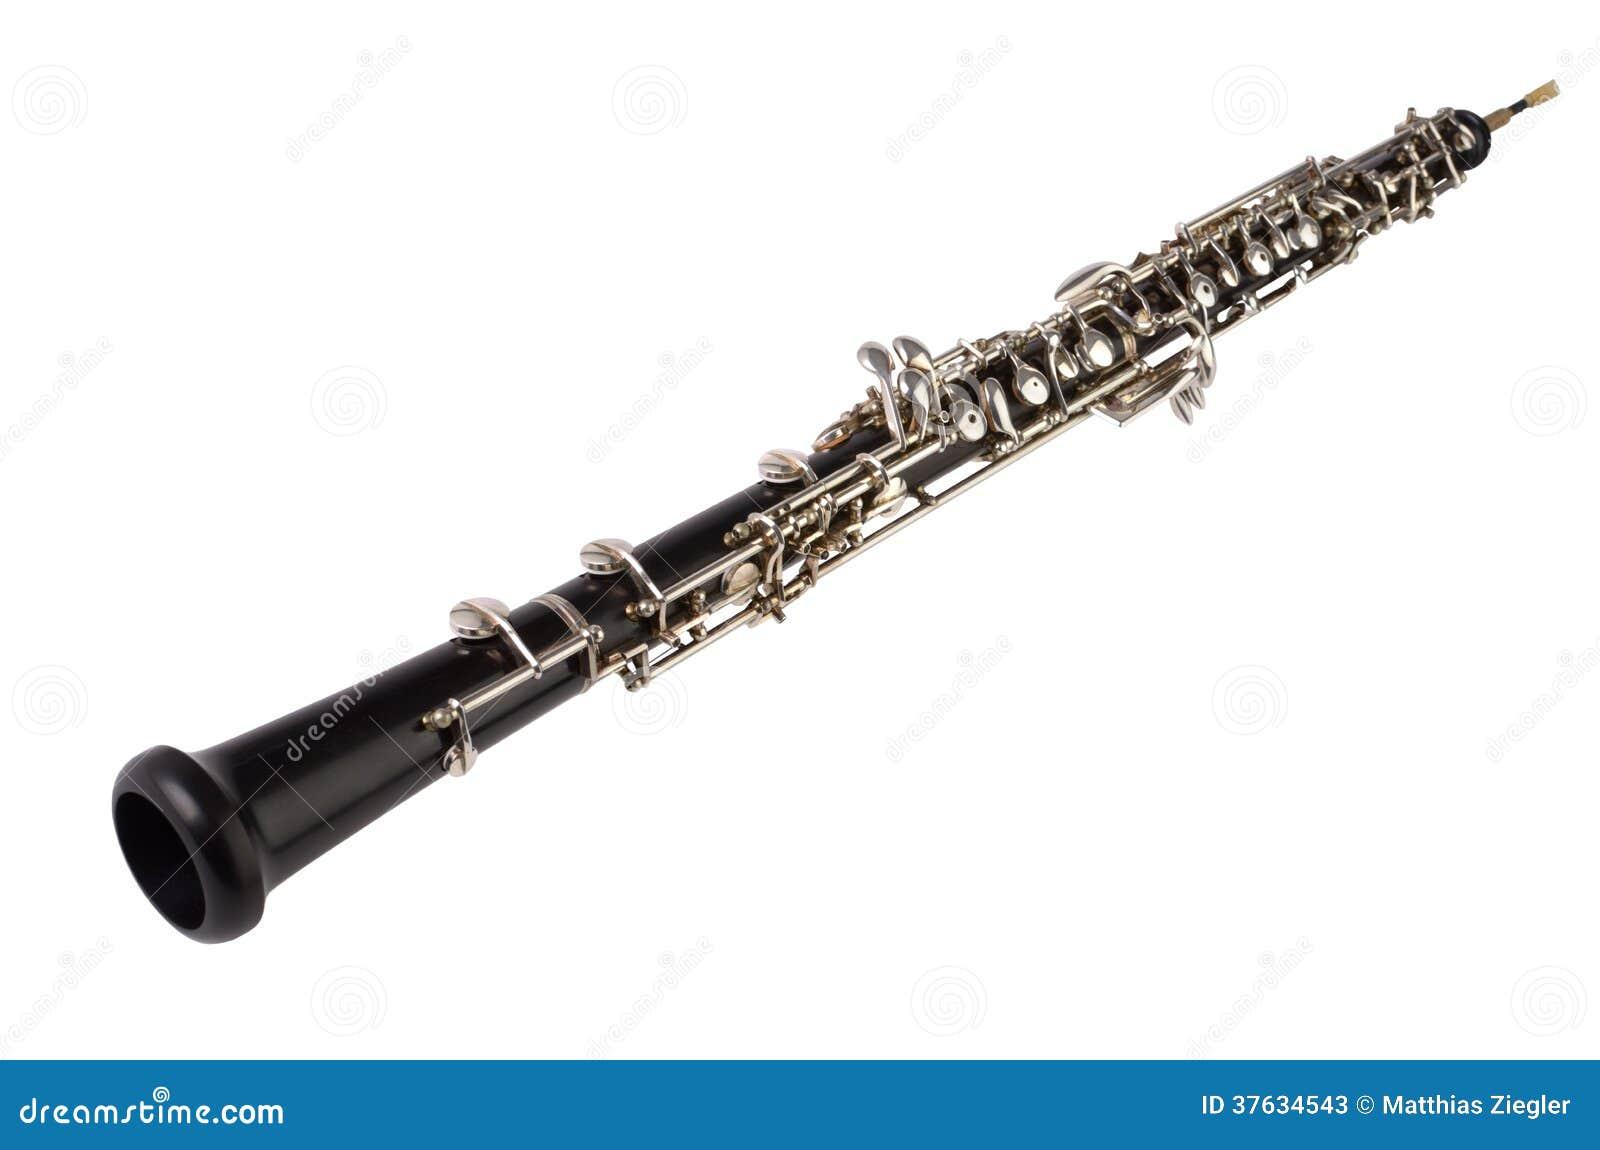 Clipart Oboe Oboe on white background Stock